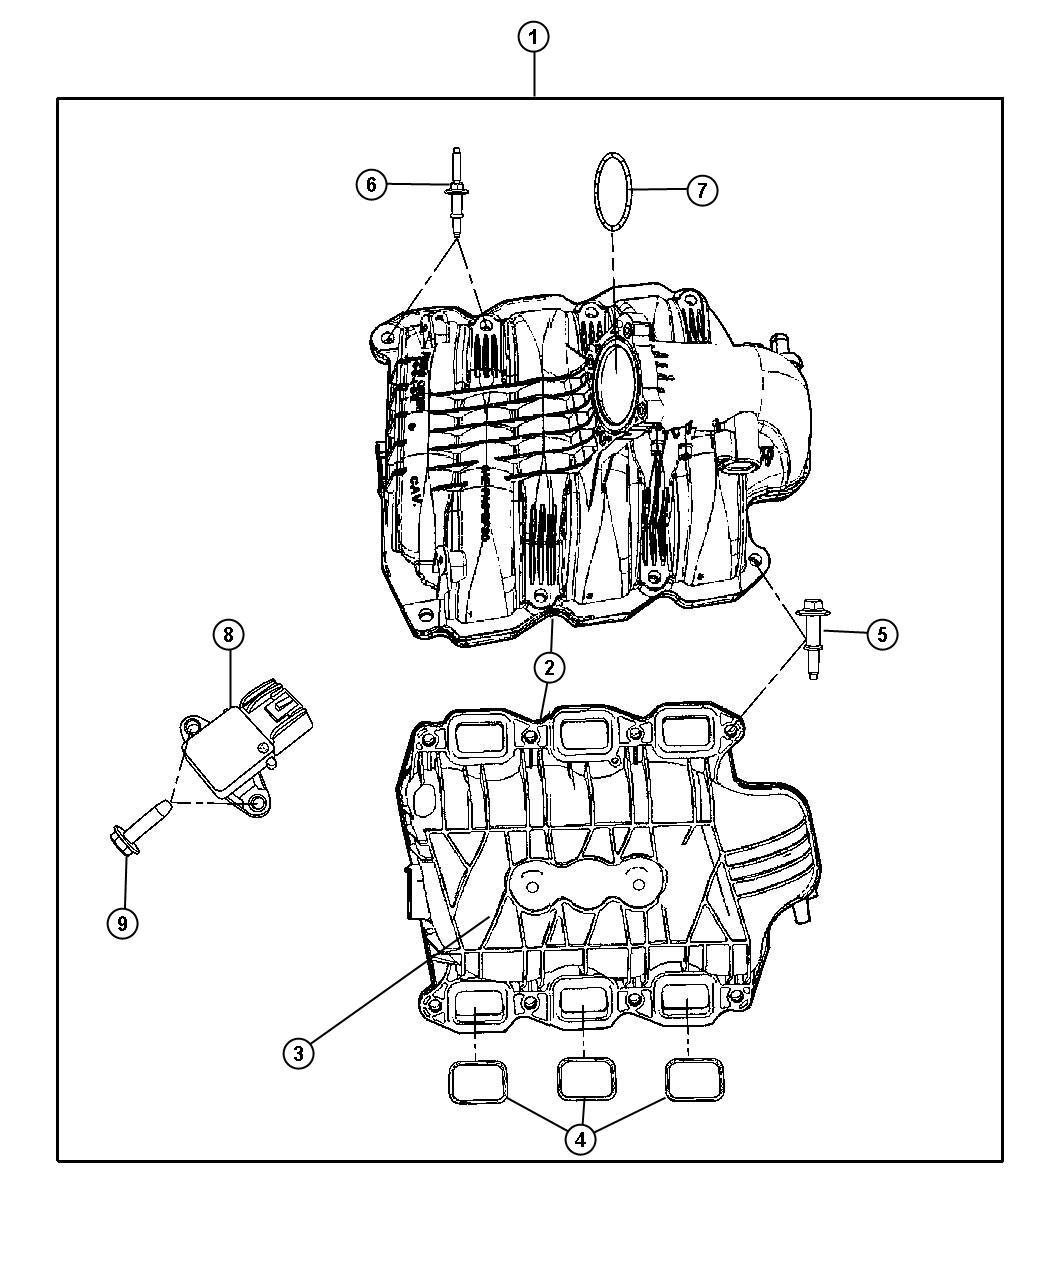 Dodge Durango Pad. Engine. Ekg, intake, manifolds